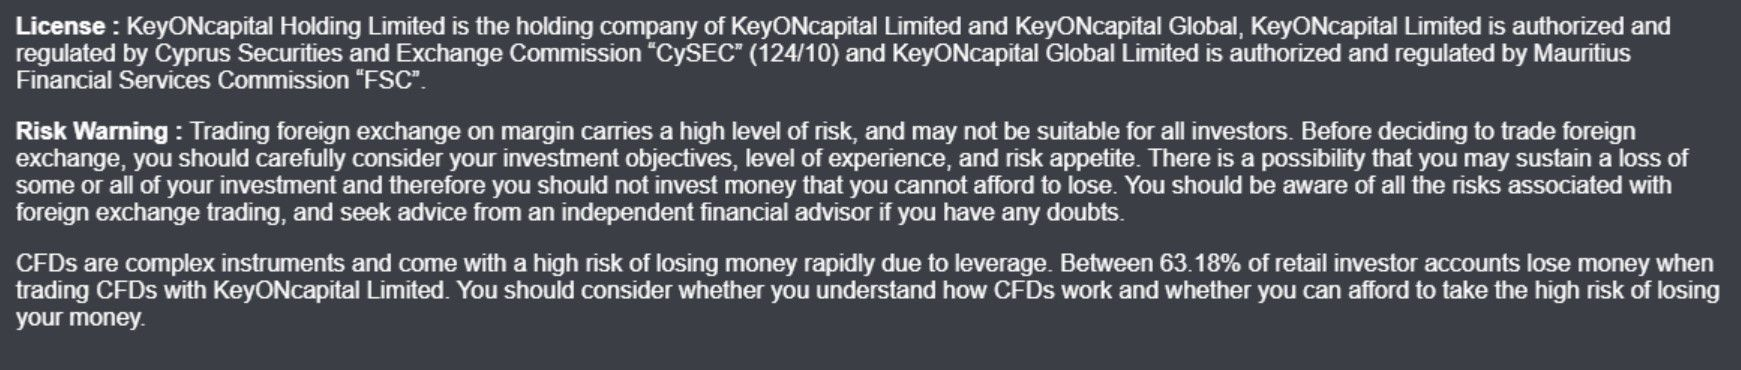 key on capital terms